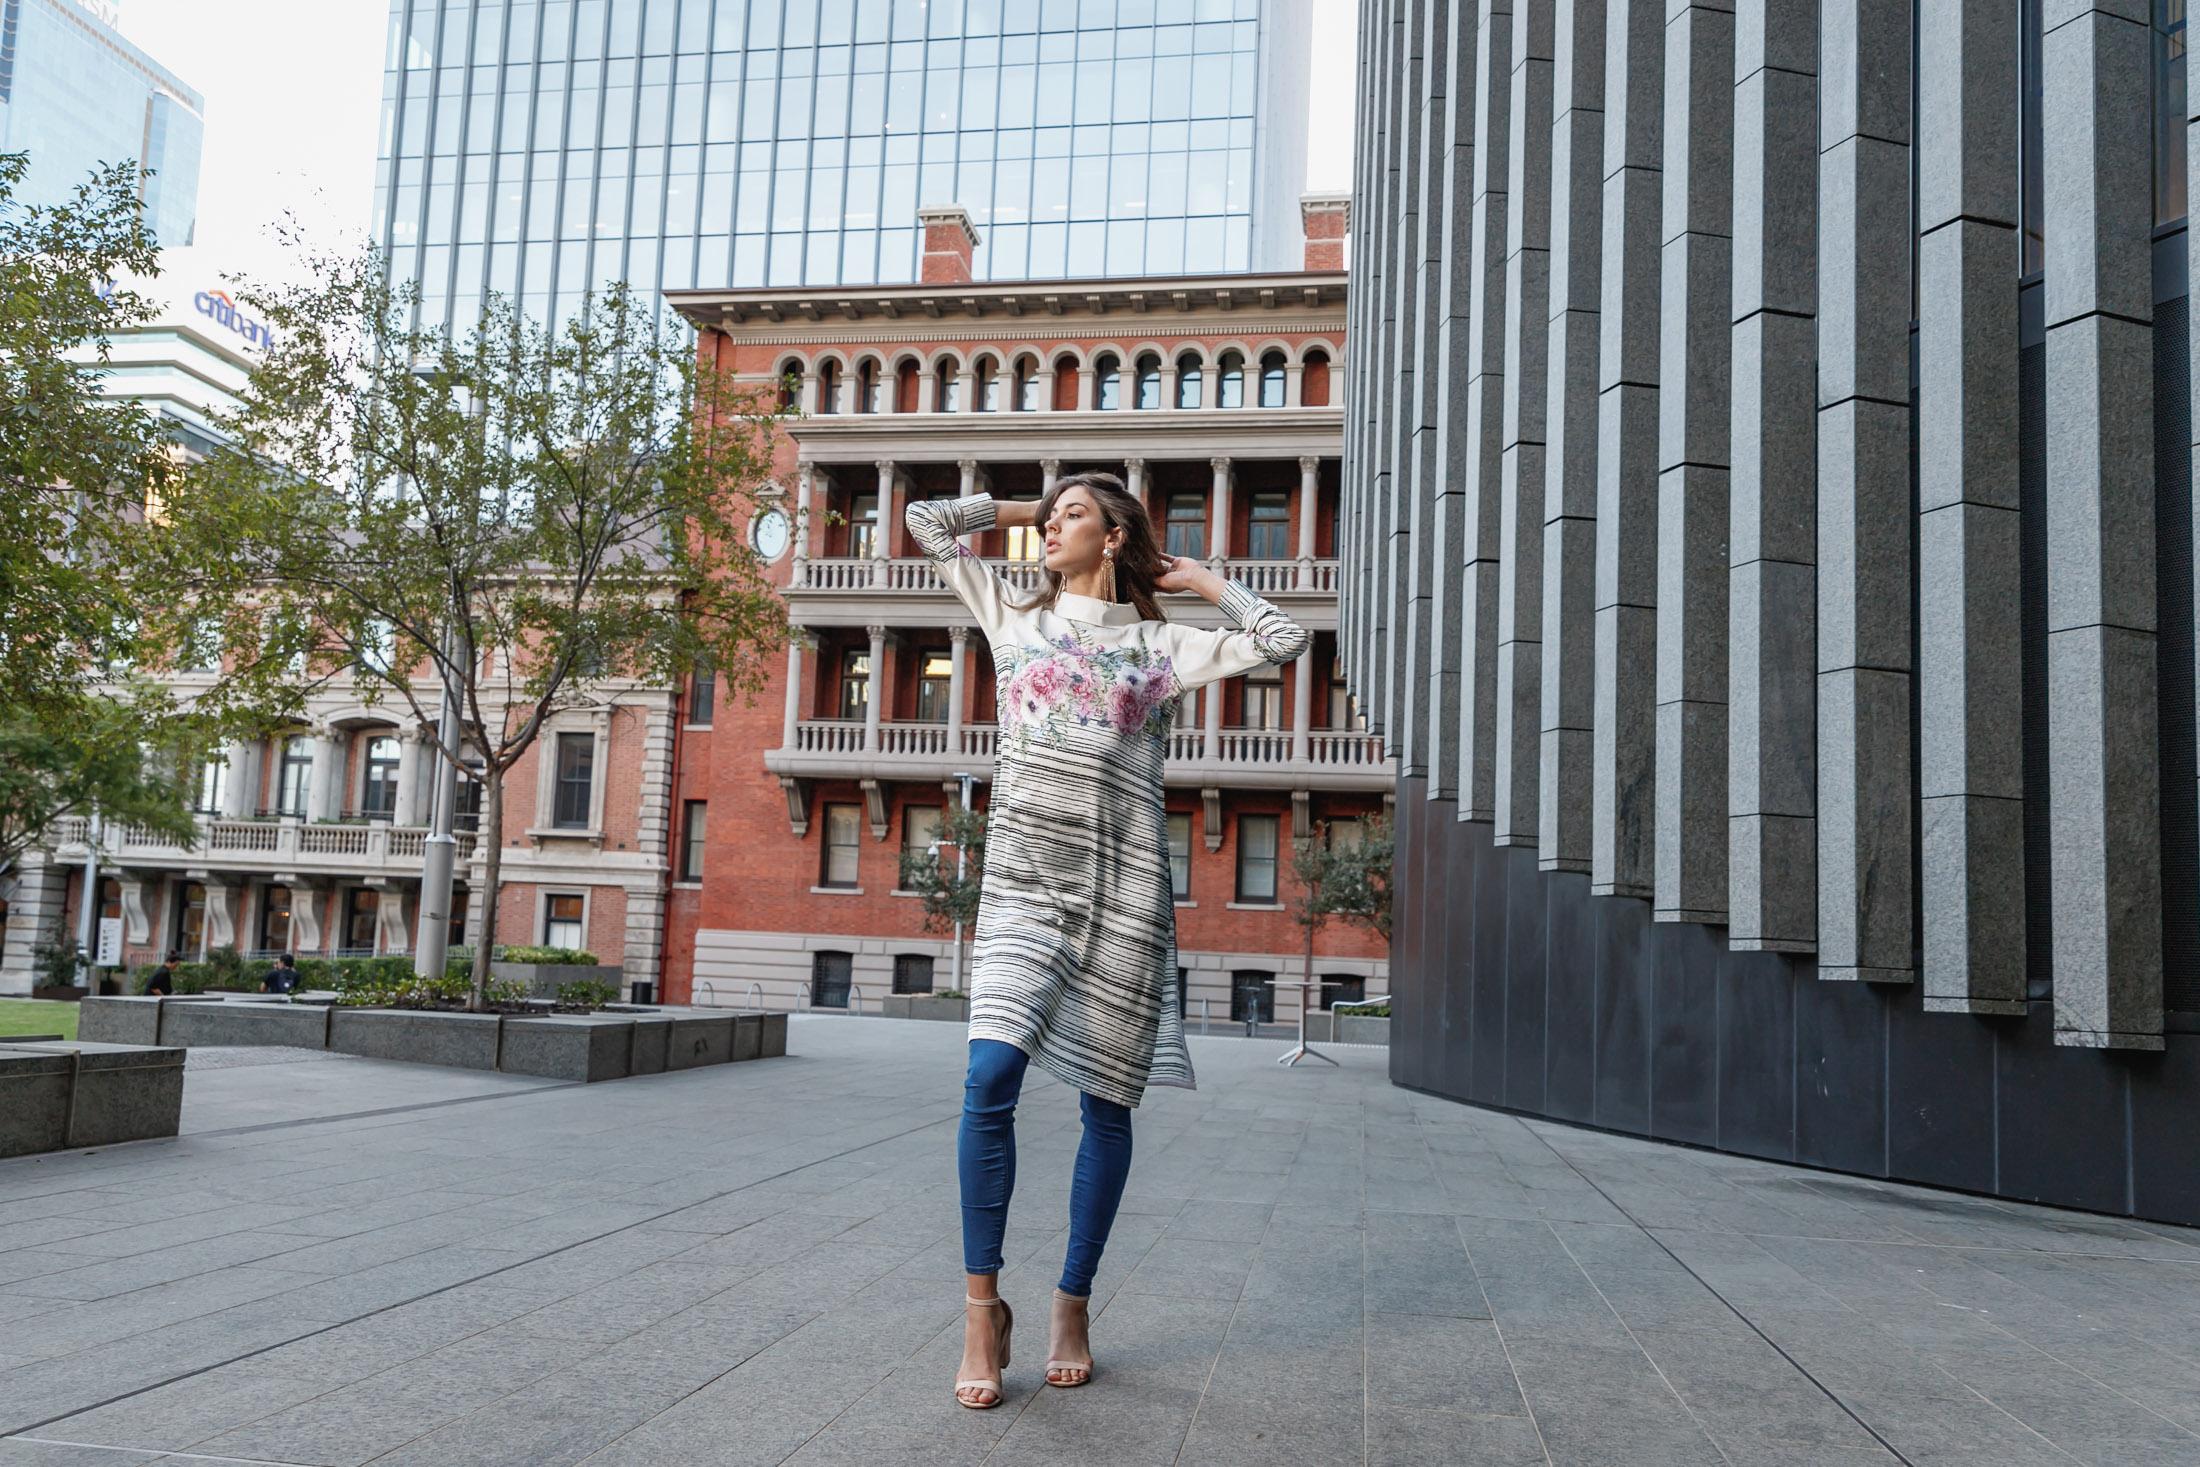 Ammon_Creative-Fashion_Photography-Vogue_Sultana_Bangladesh-Old_Treasury-Perth-003-2053.jpg